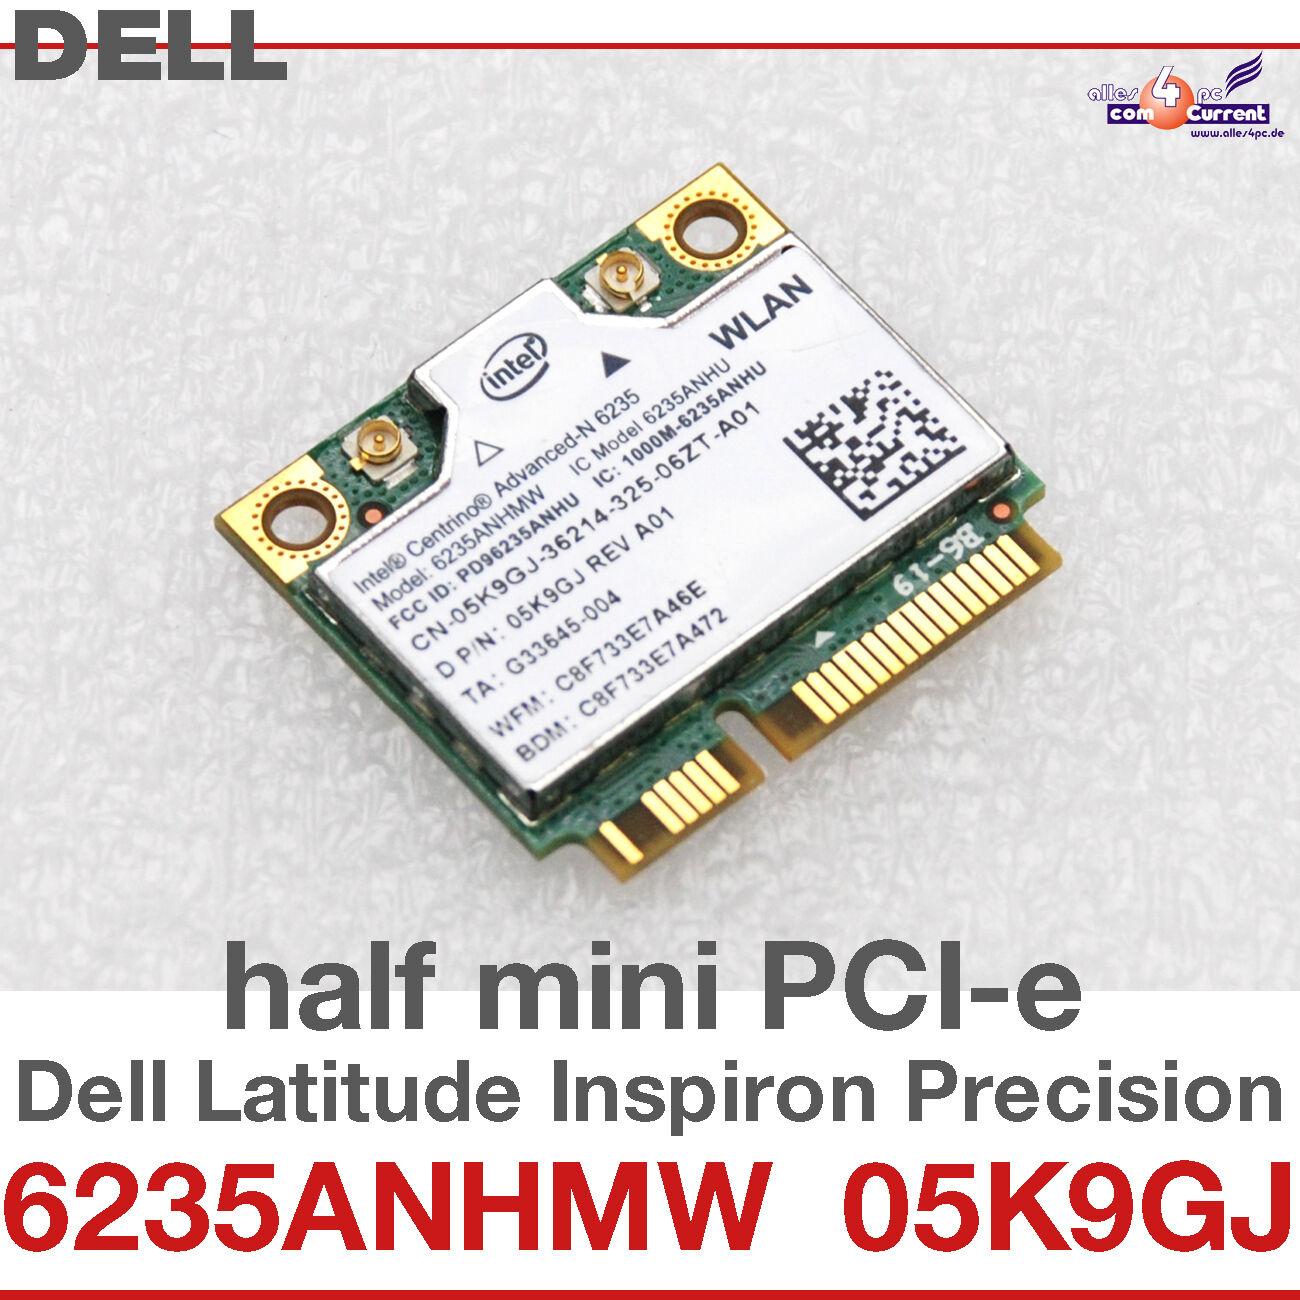 Wireless network card wifi wlan for Dell mini 05k9gj 6235 ANHMW #d03